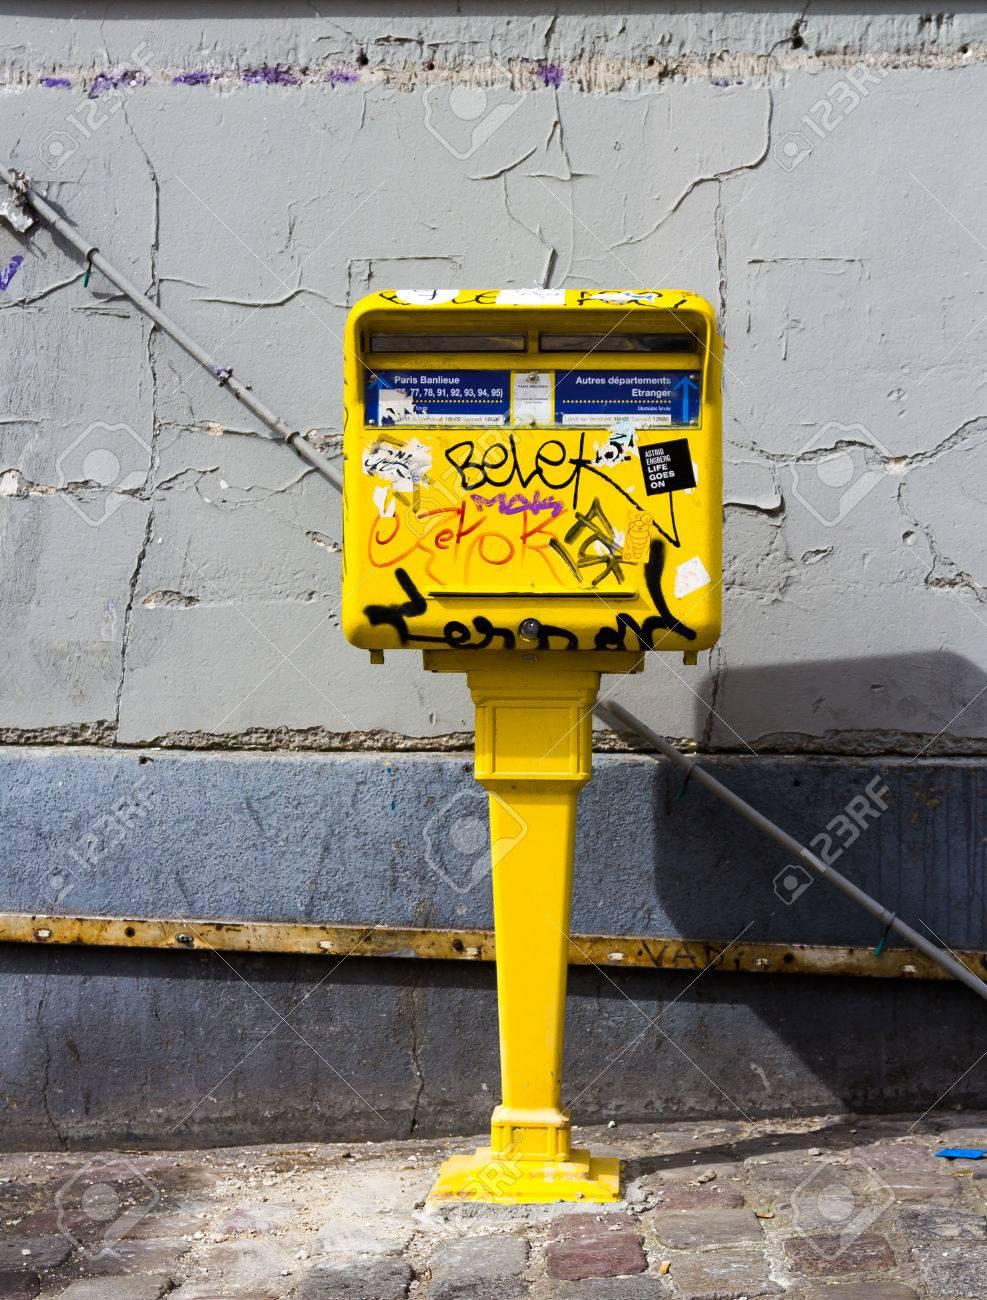 PARIS, FRANCE - 19TH MARCH 2014 A postcode covered in Graffiti